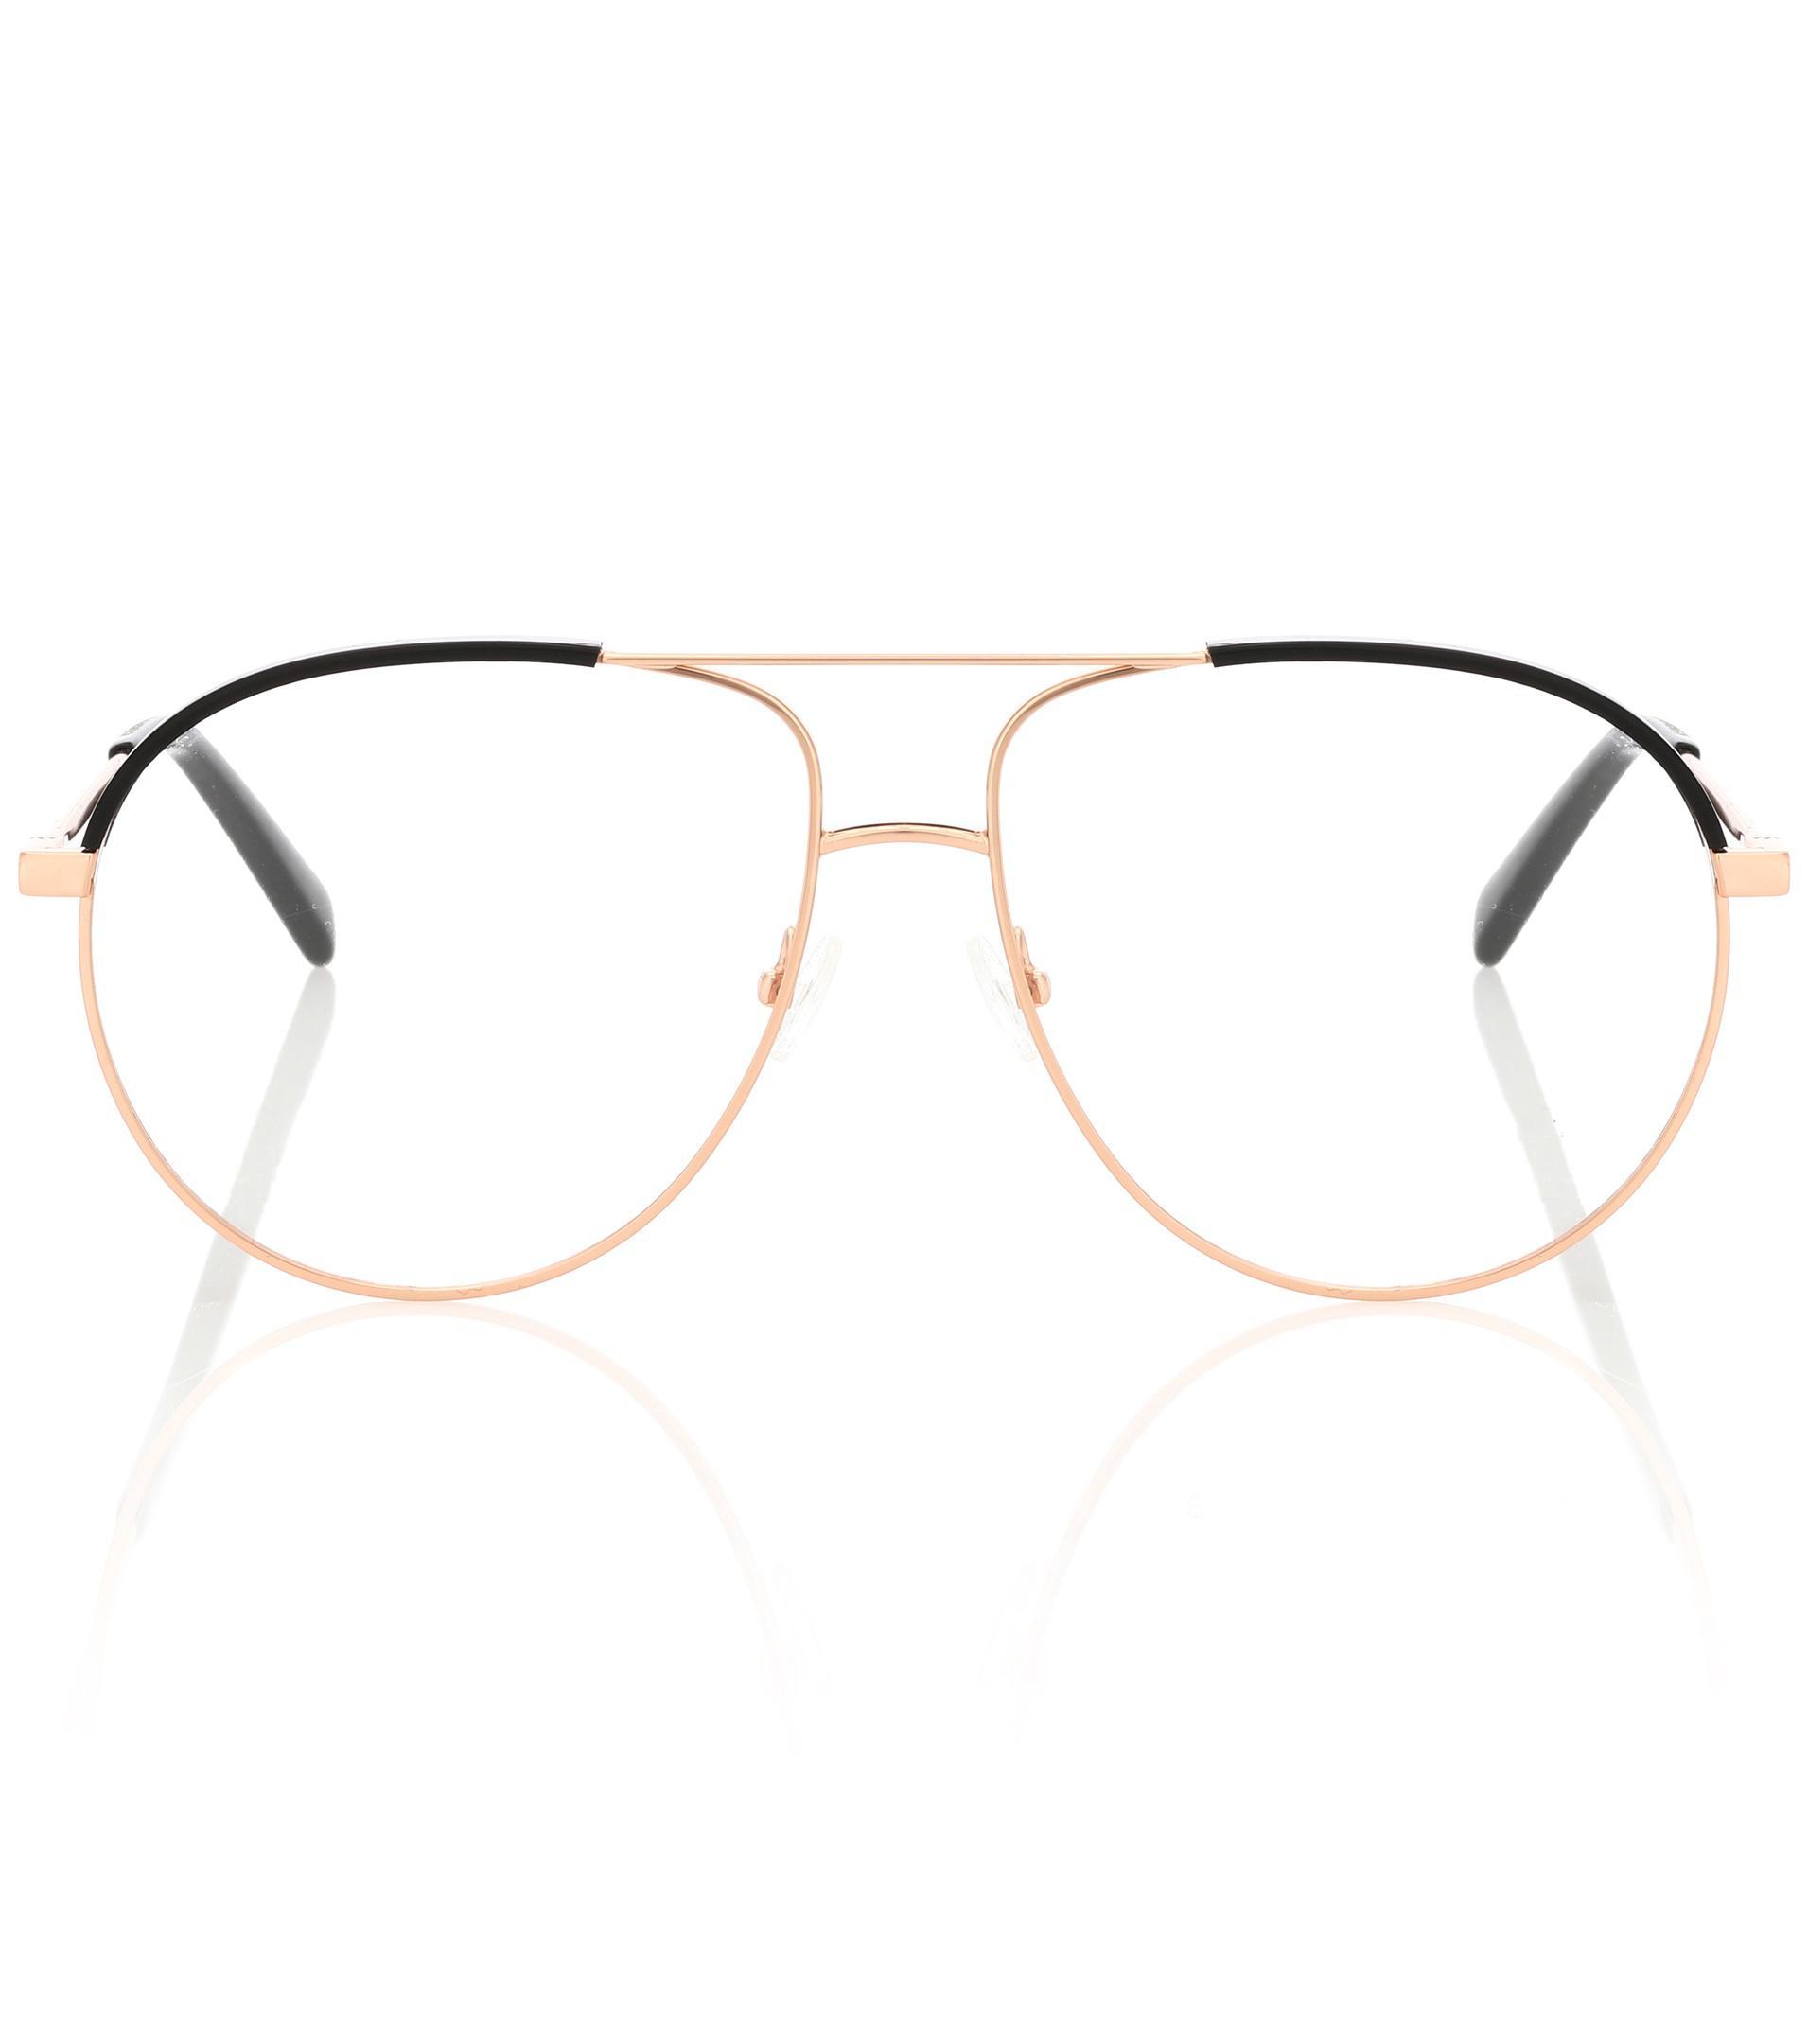 926b666cf8679 Lyst - Stella McCartney Aviator Glasses in Metallic